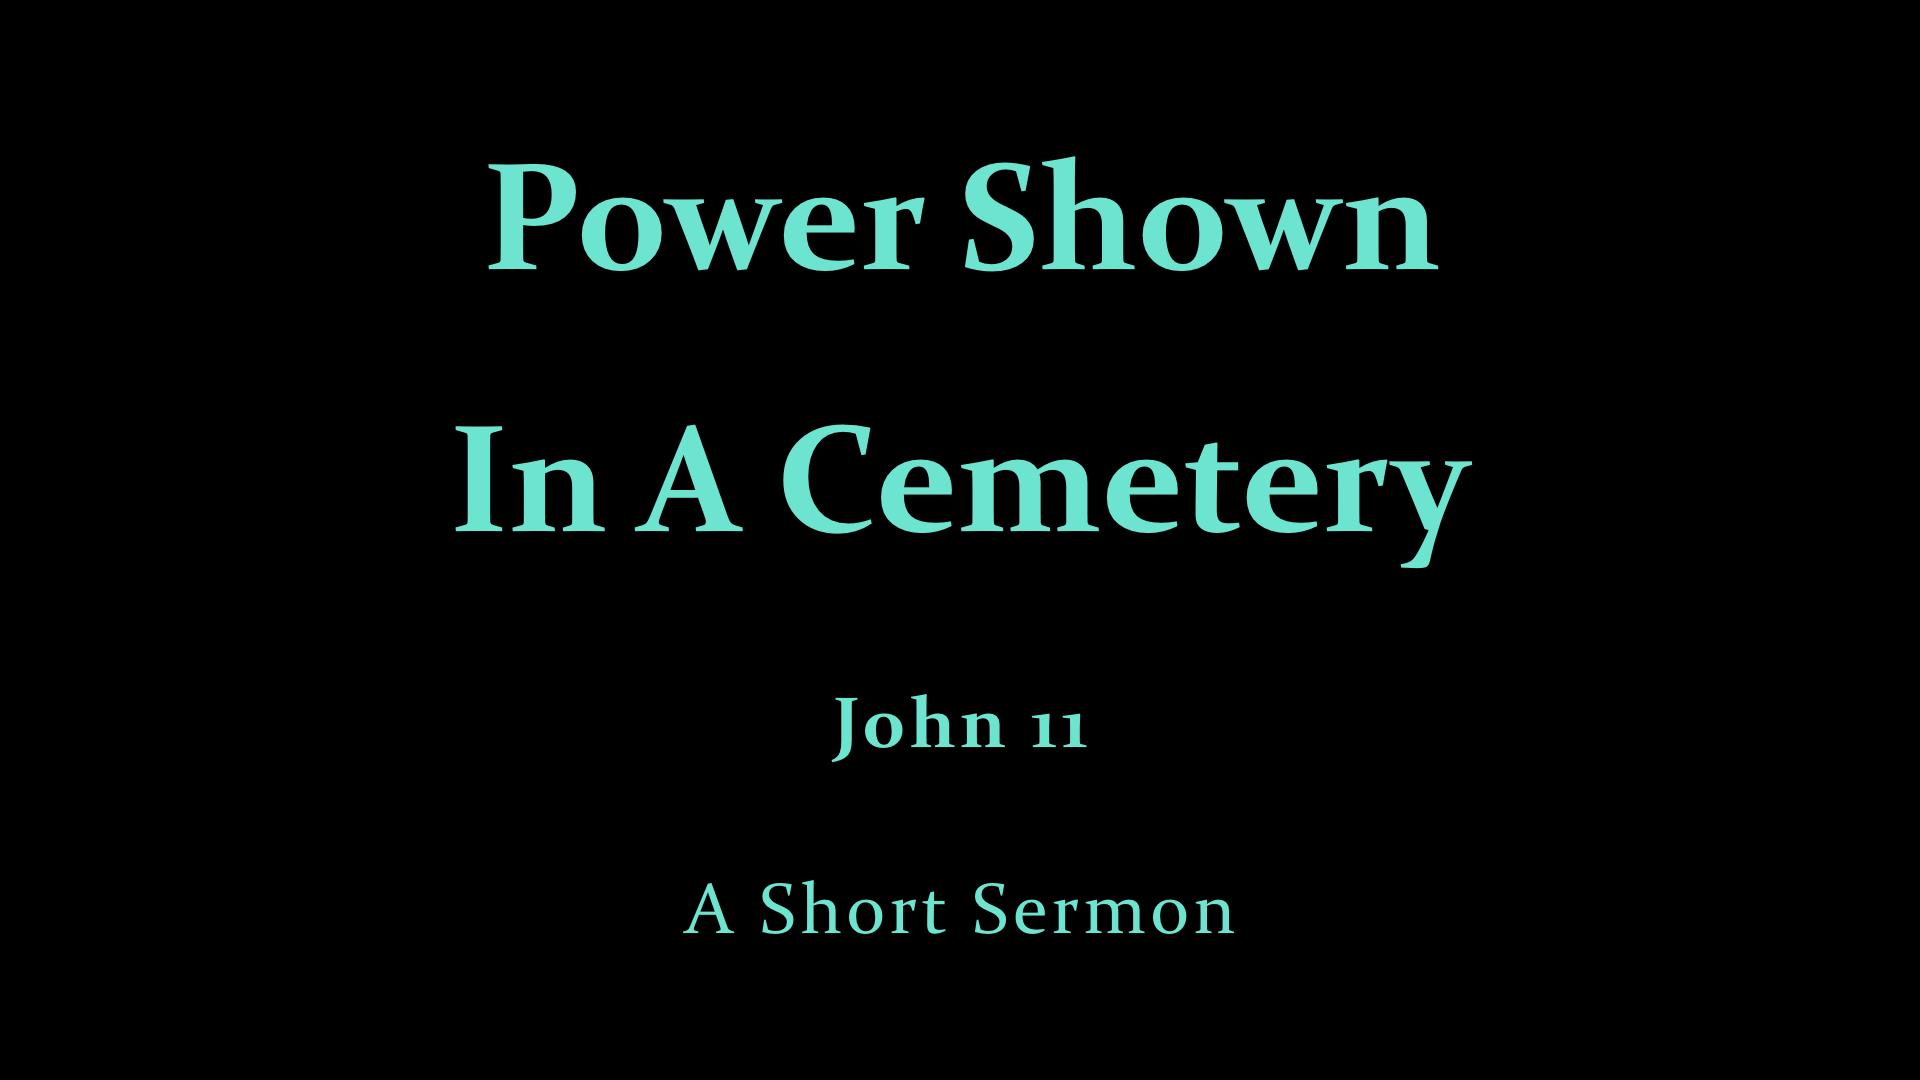 Jn 11 - Power Shown In A Cemetery - A Short Sermon.001.jpeg